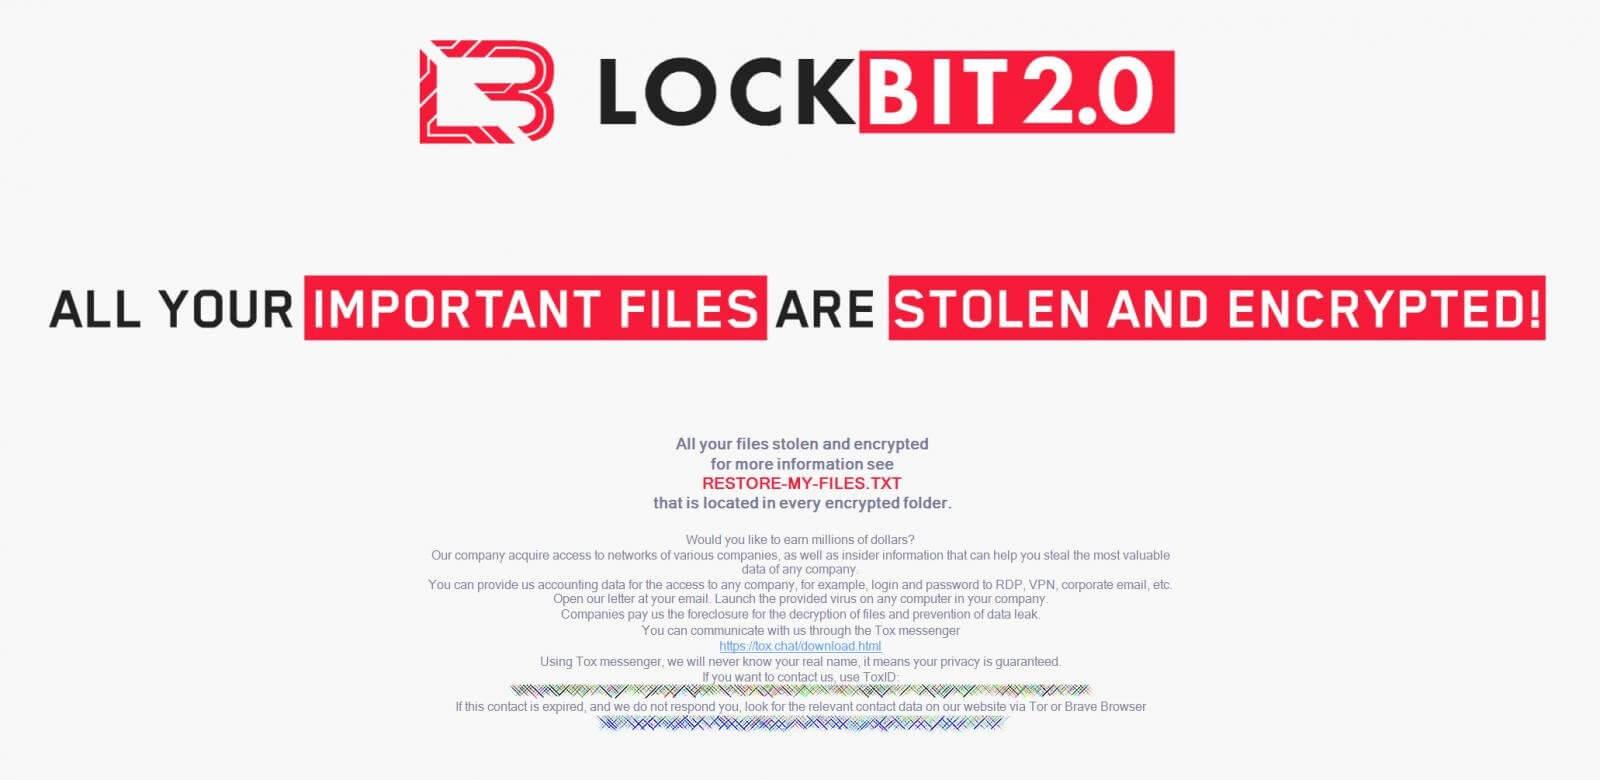 New LockBit 2.0 wallpaper recruiting insiders